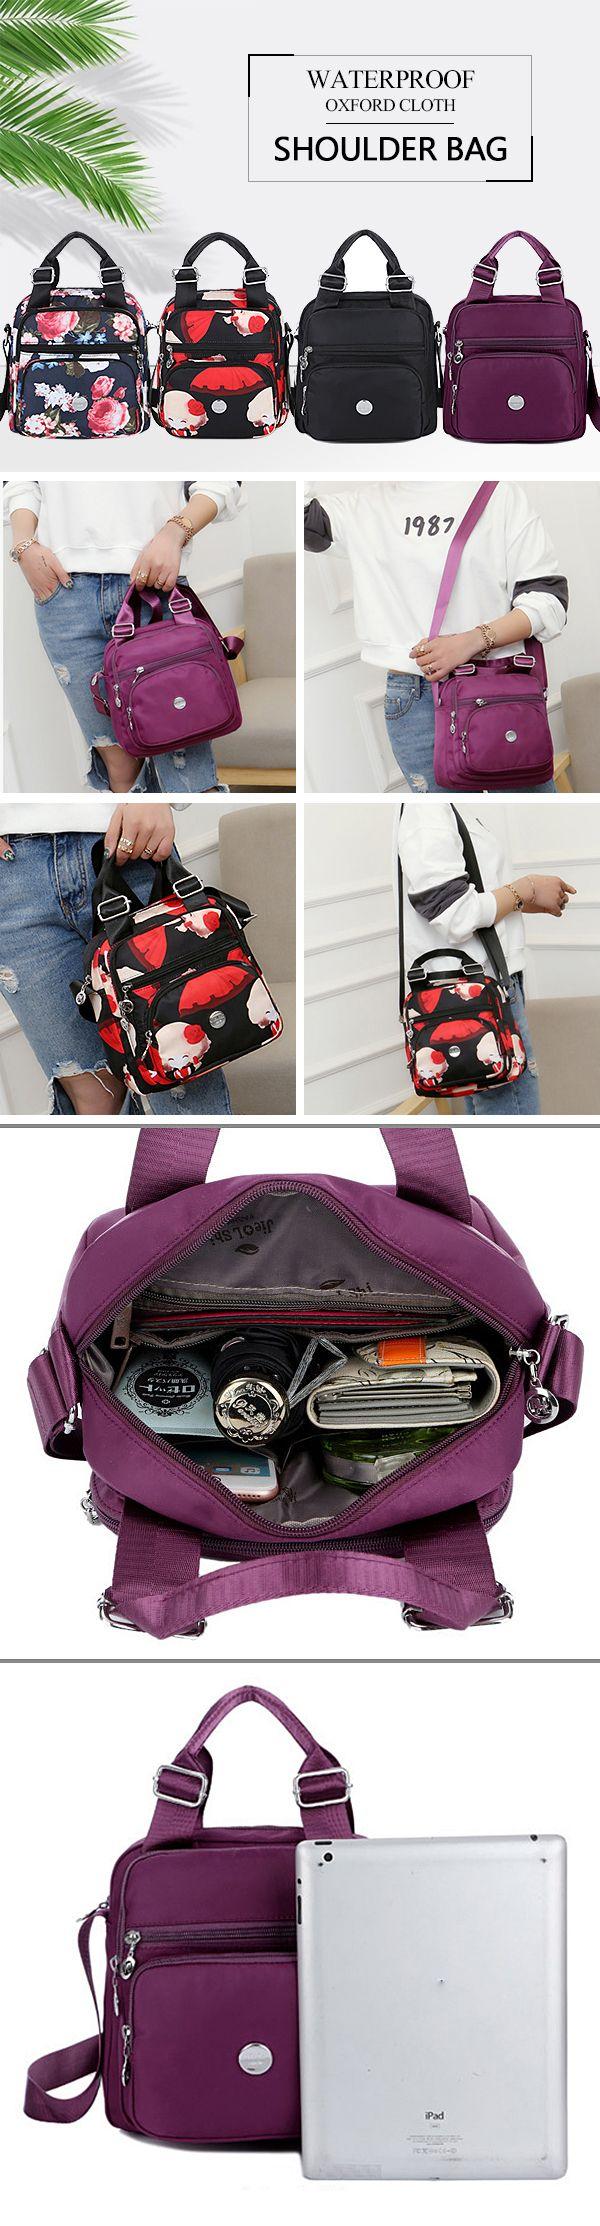 [$ 17.79]  Waterproof Oxford Cloth Women Handbag Crossbody Bag Shoulder Bag